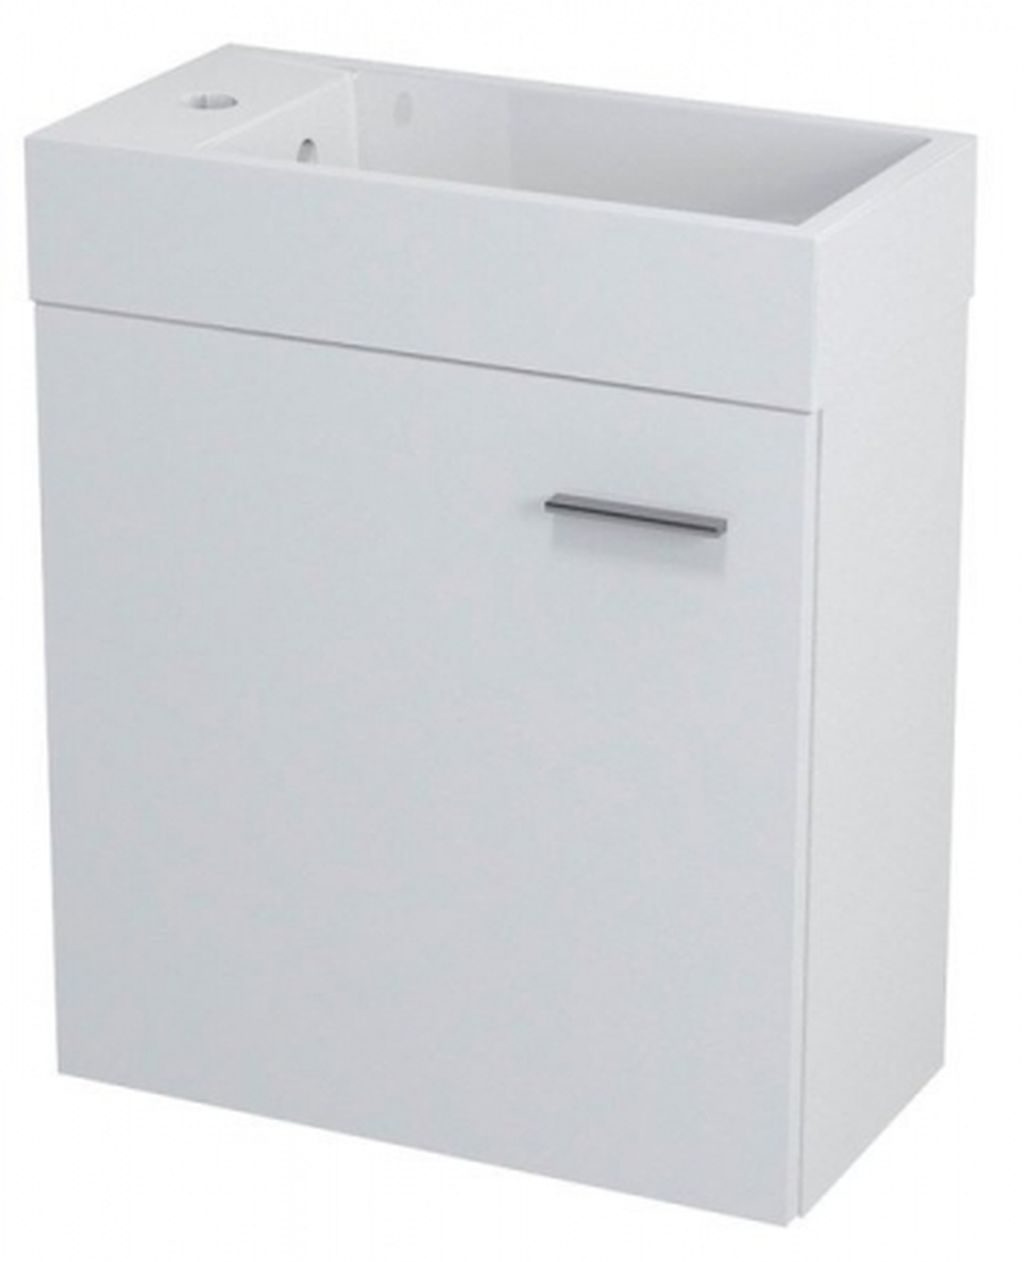 SAPHO LATUS IV umyvadlová skříňka 49,5x50x25cm, bílá 55570